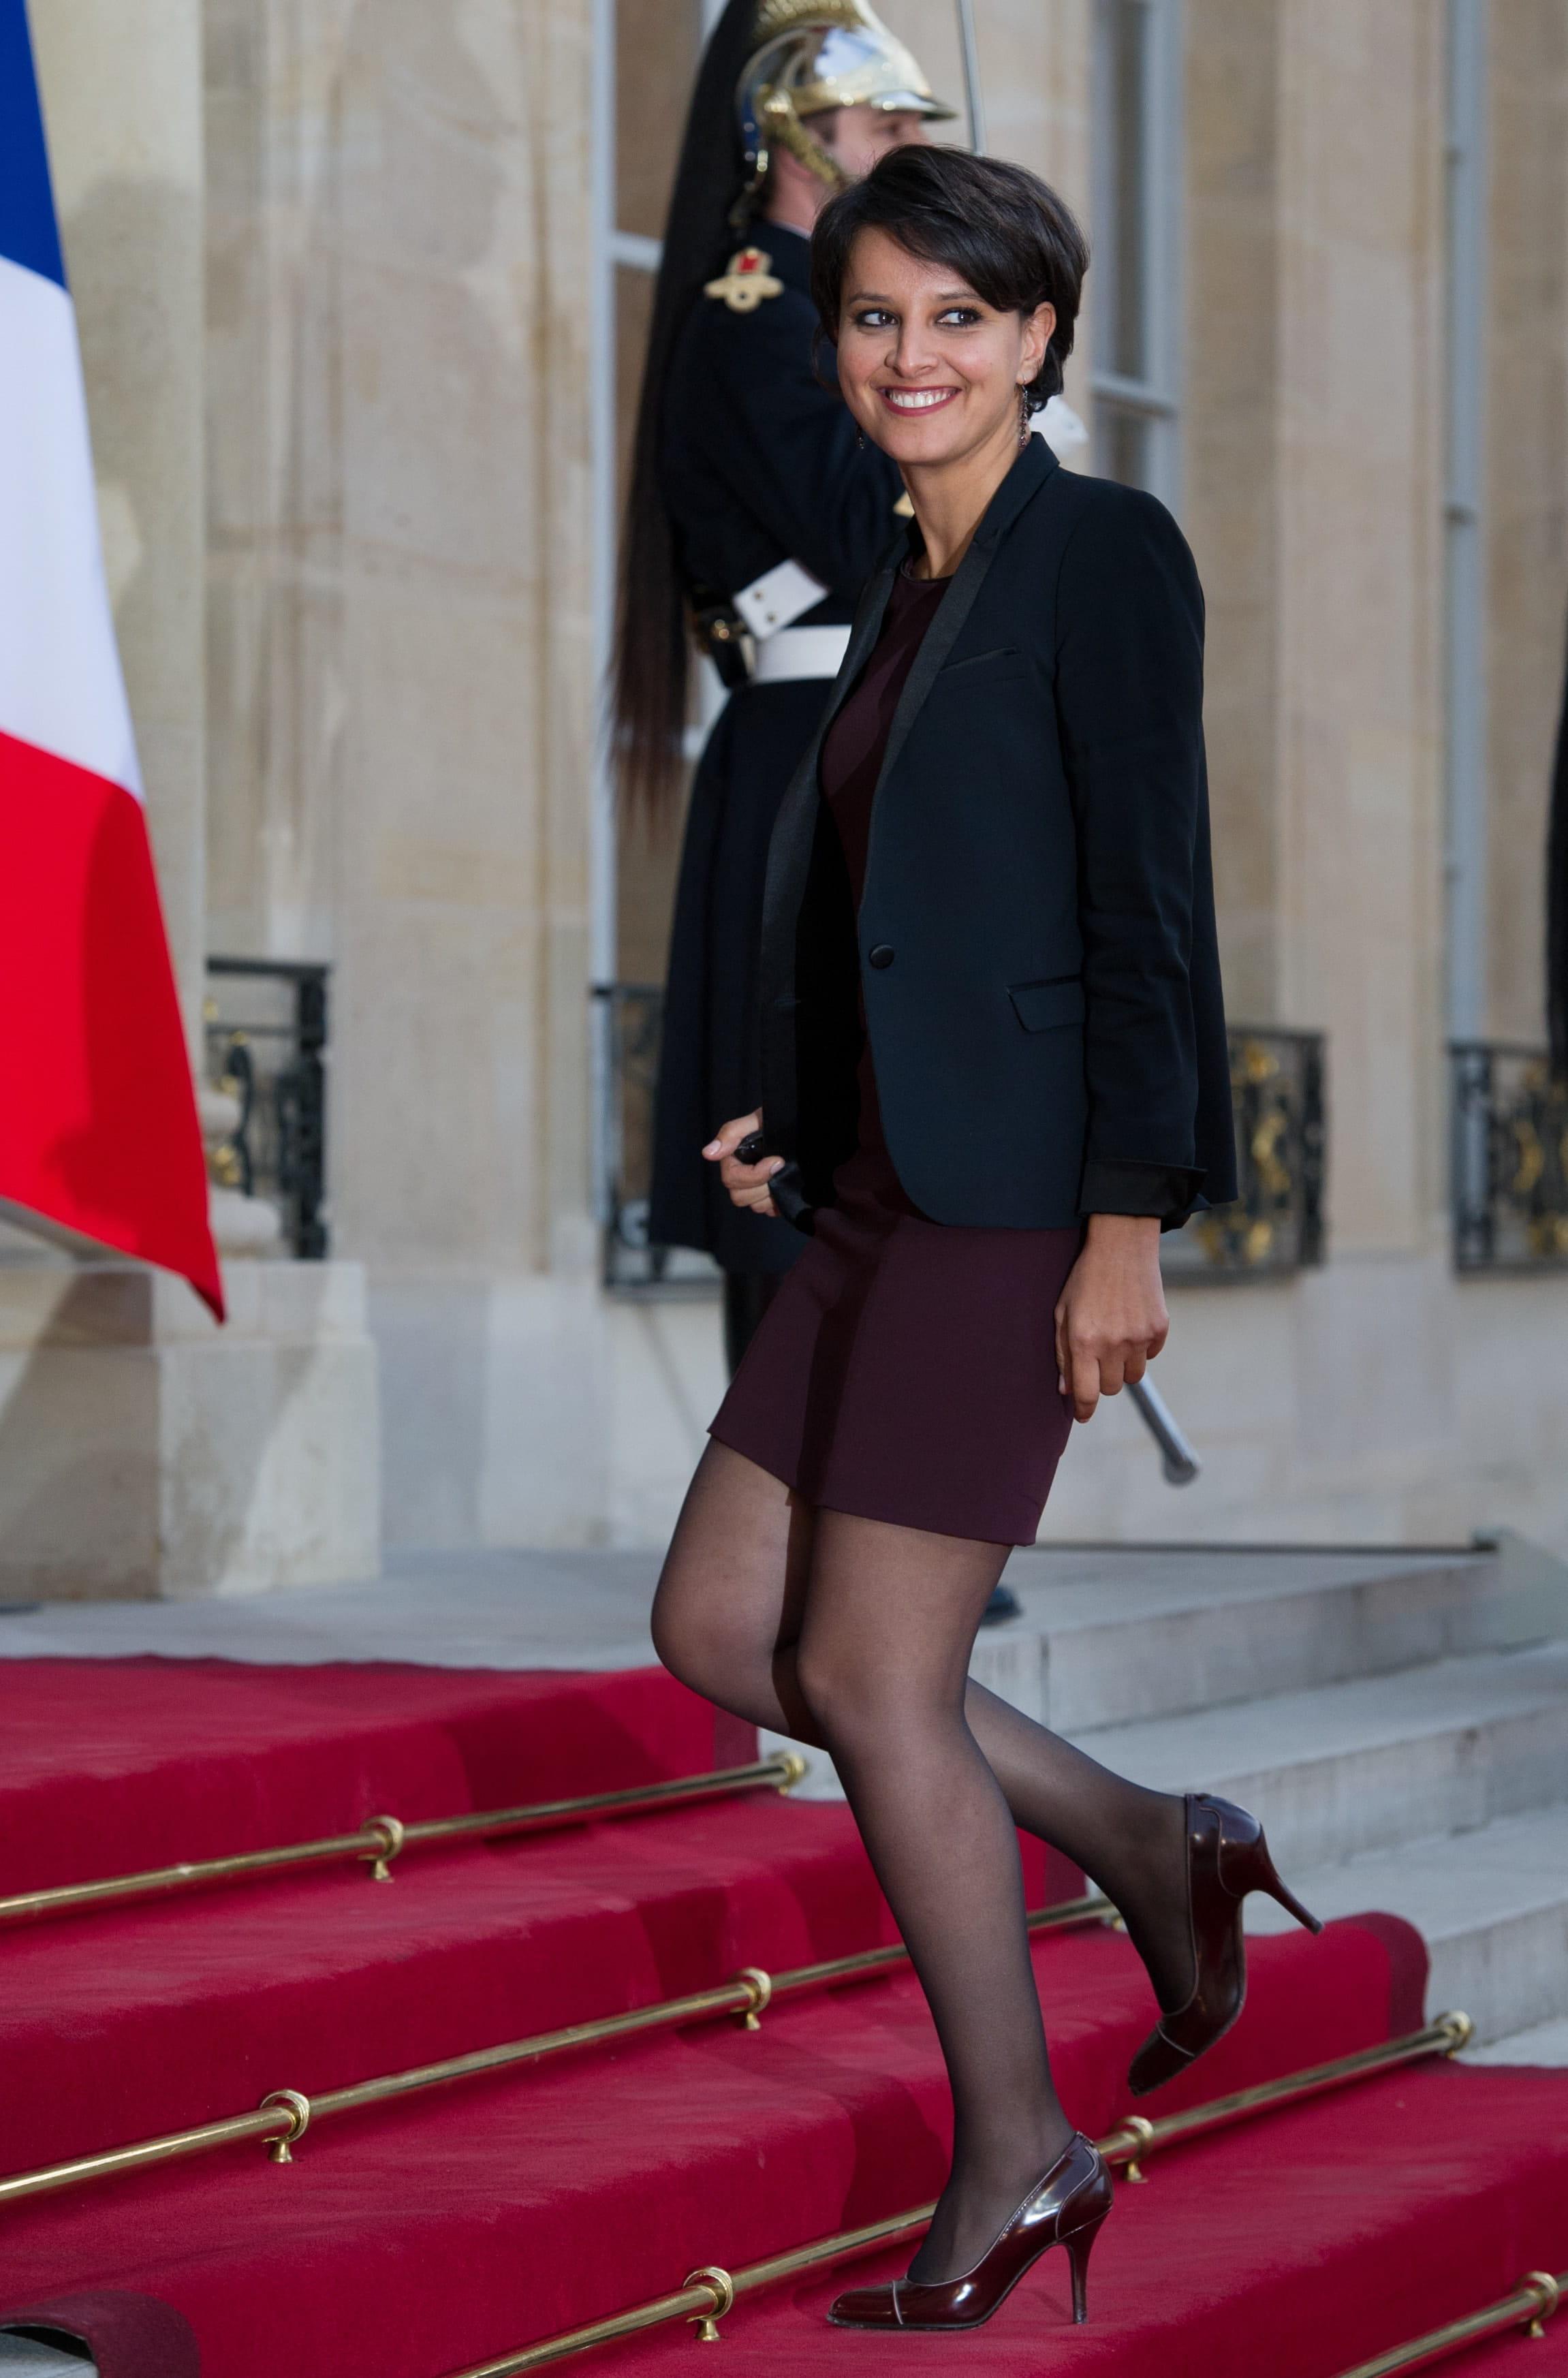 Najat vallaud belka cem montre sa culotte - Sonia mabrouk mariee biographie ...